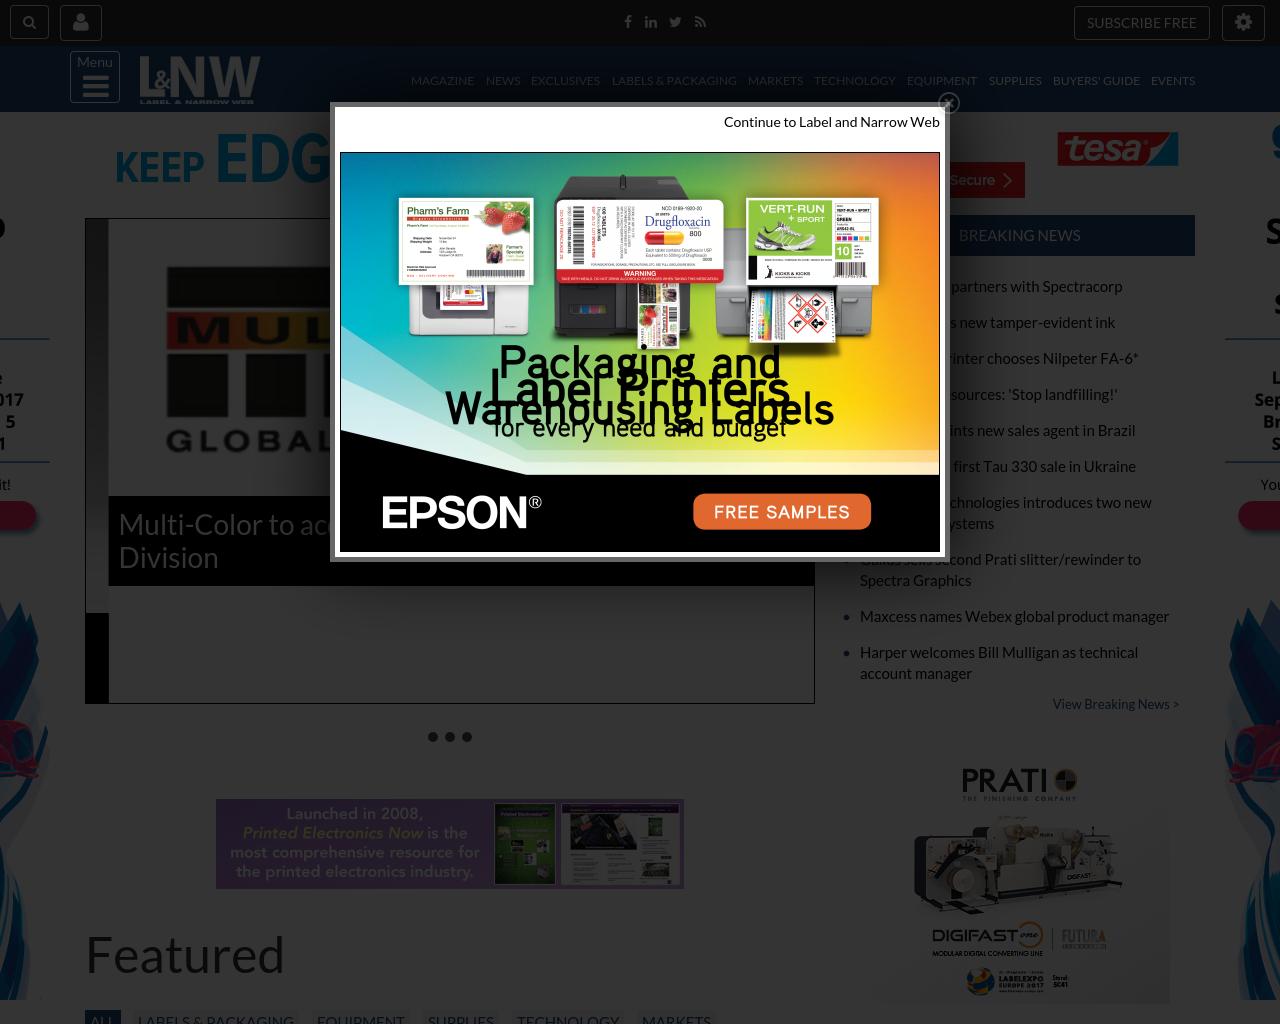 Label-&-Narrow-Web-Advertising-Reviews-Pricing